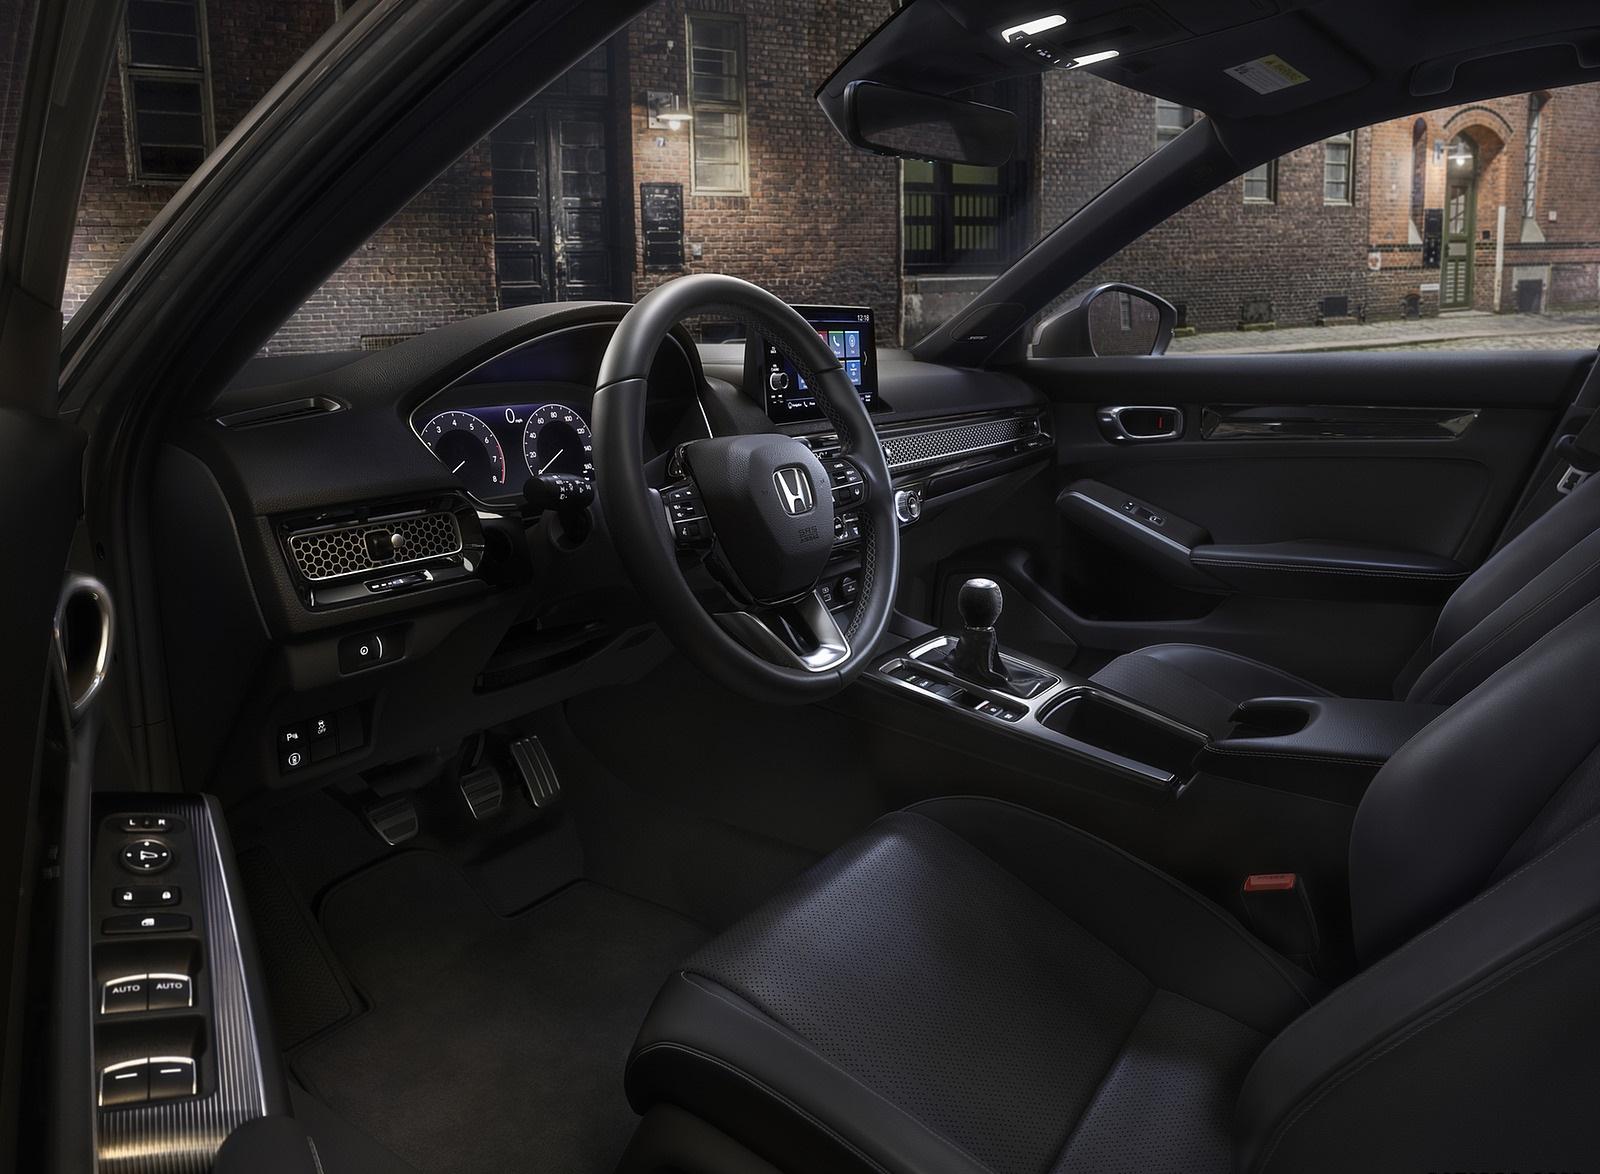 2022 Honda Civic Hatchback Interior Wallpapers (6)